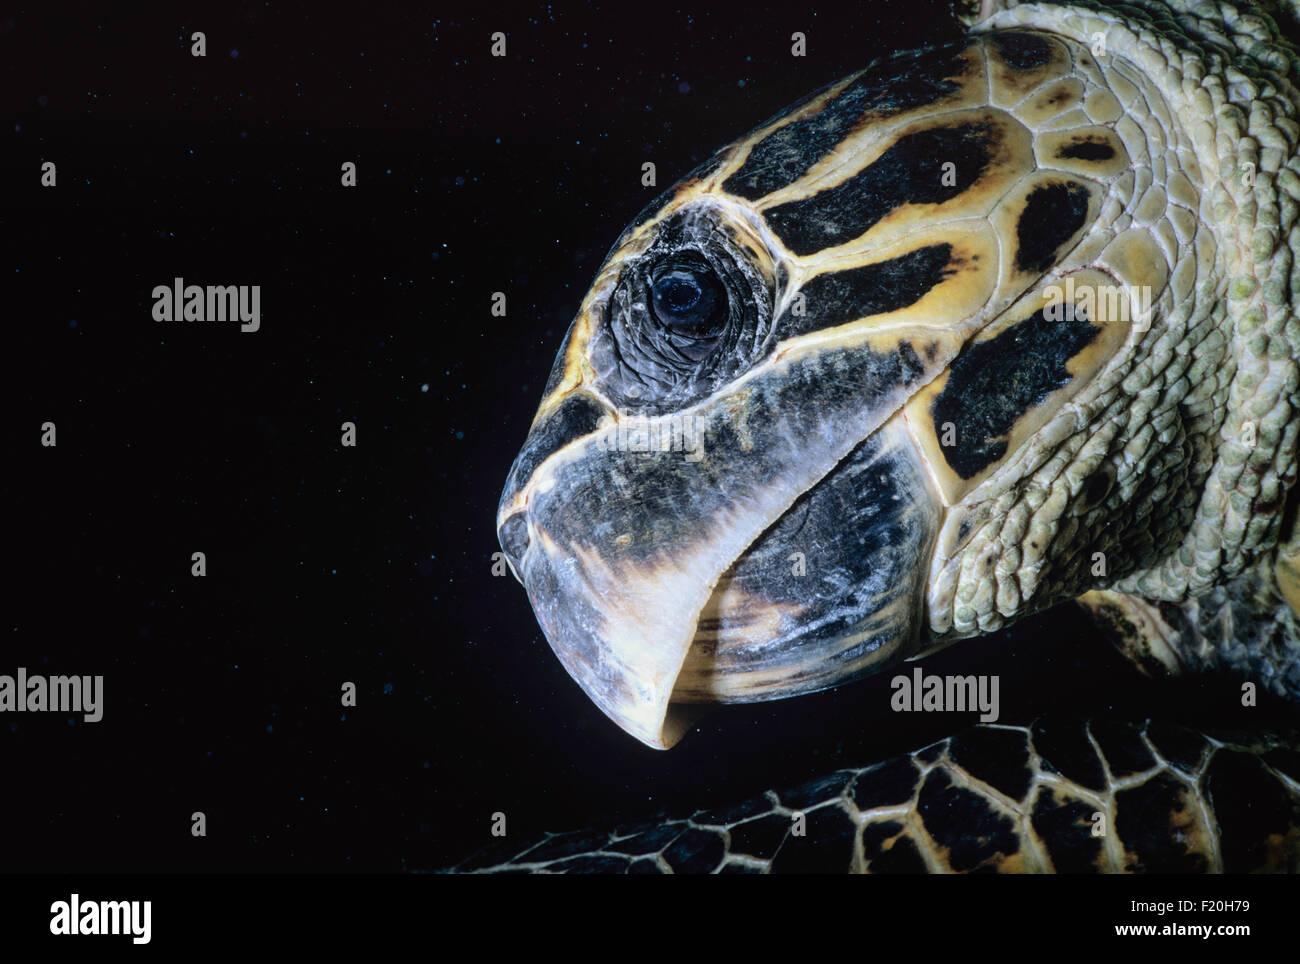 Endangered Hawksbill Turtle (Eretmochelys imbricata) swimming at night, Ras Mohammed, Egypt - Red Sea. - Stock Image